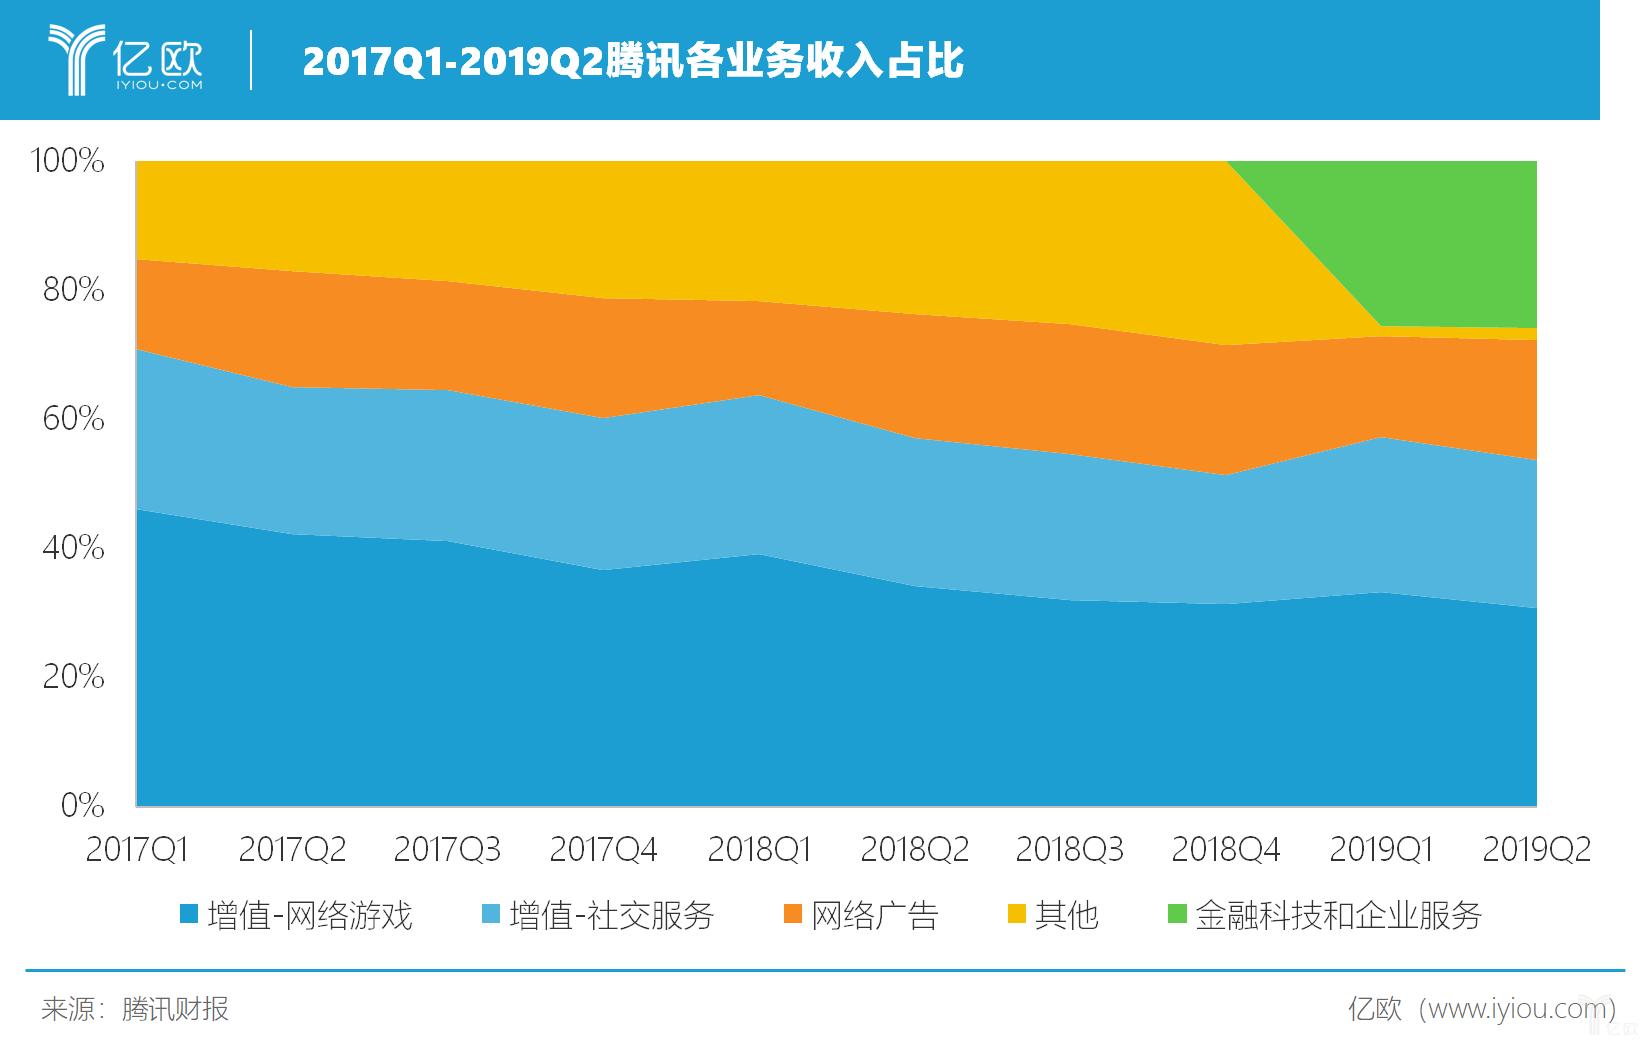 2017Q1-2019Q2腾讯各业务收入占比